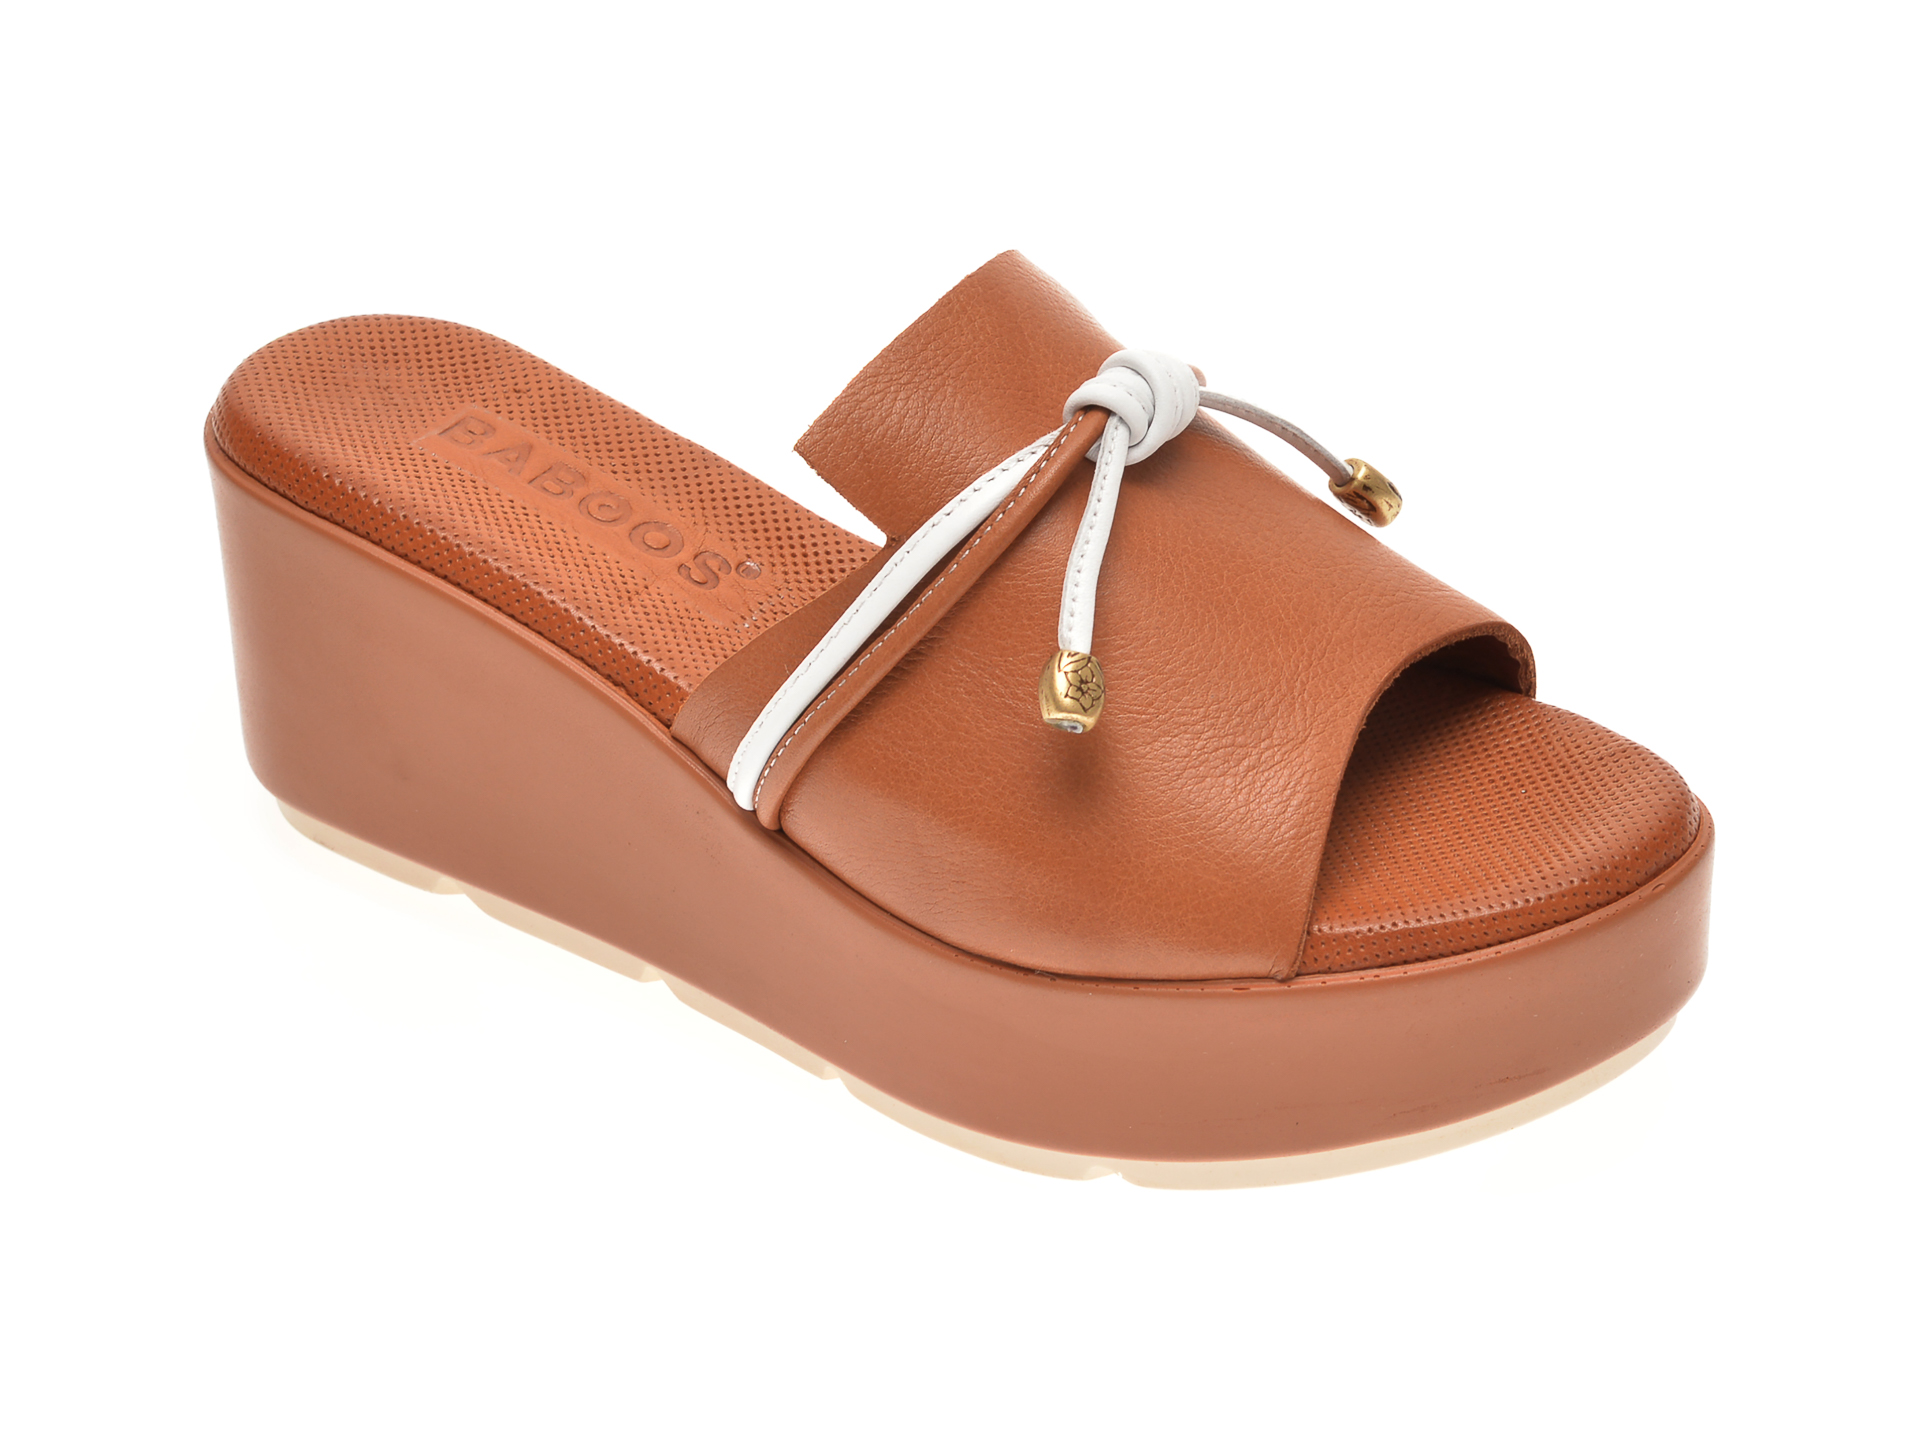 Papuci BABOOS maro, 2516, din piele intoarsa